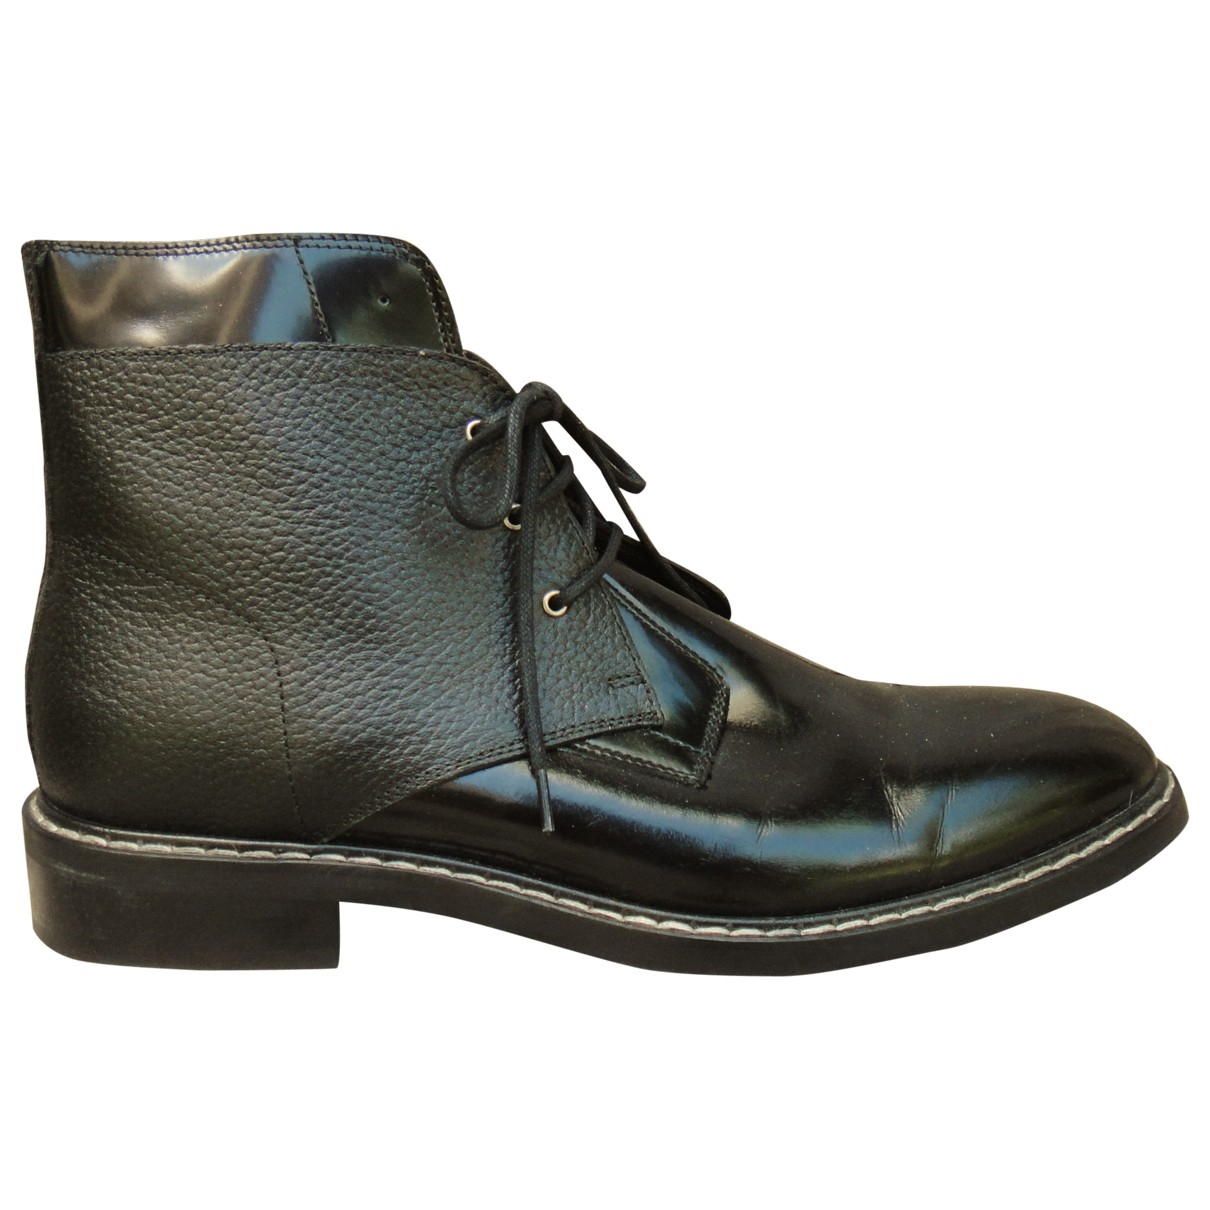 Mm6 \N Stiefeletten in  Schwarz Leder